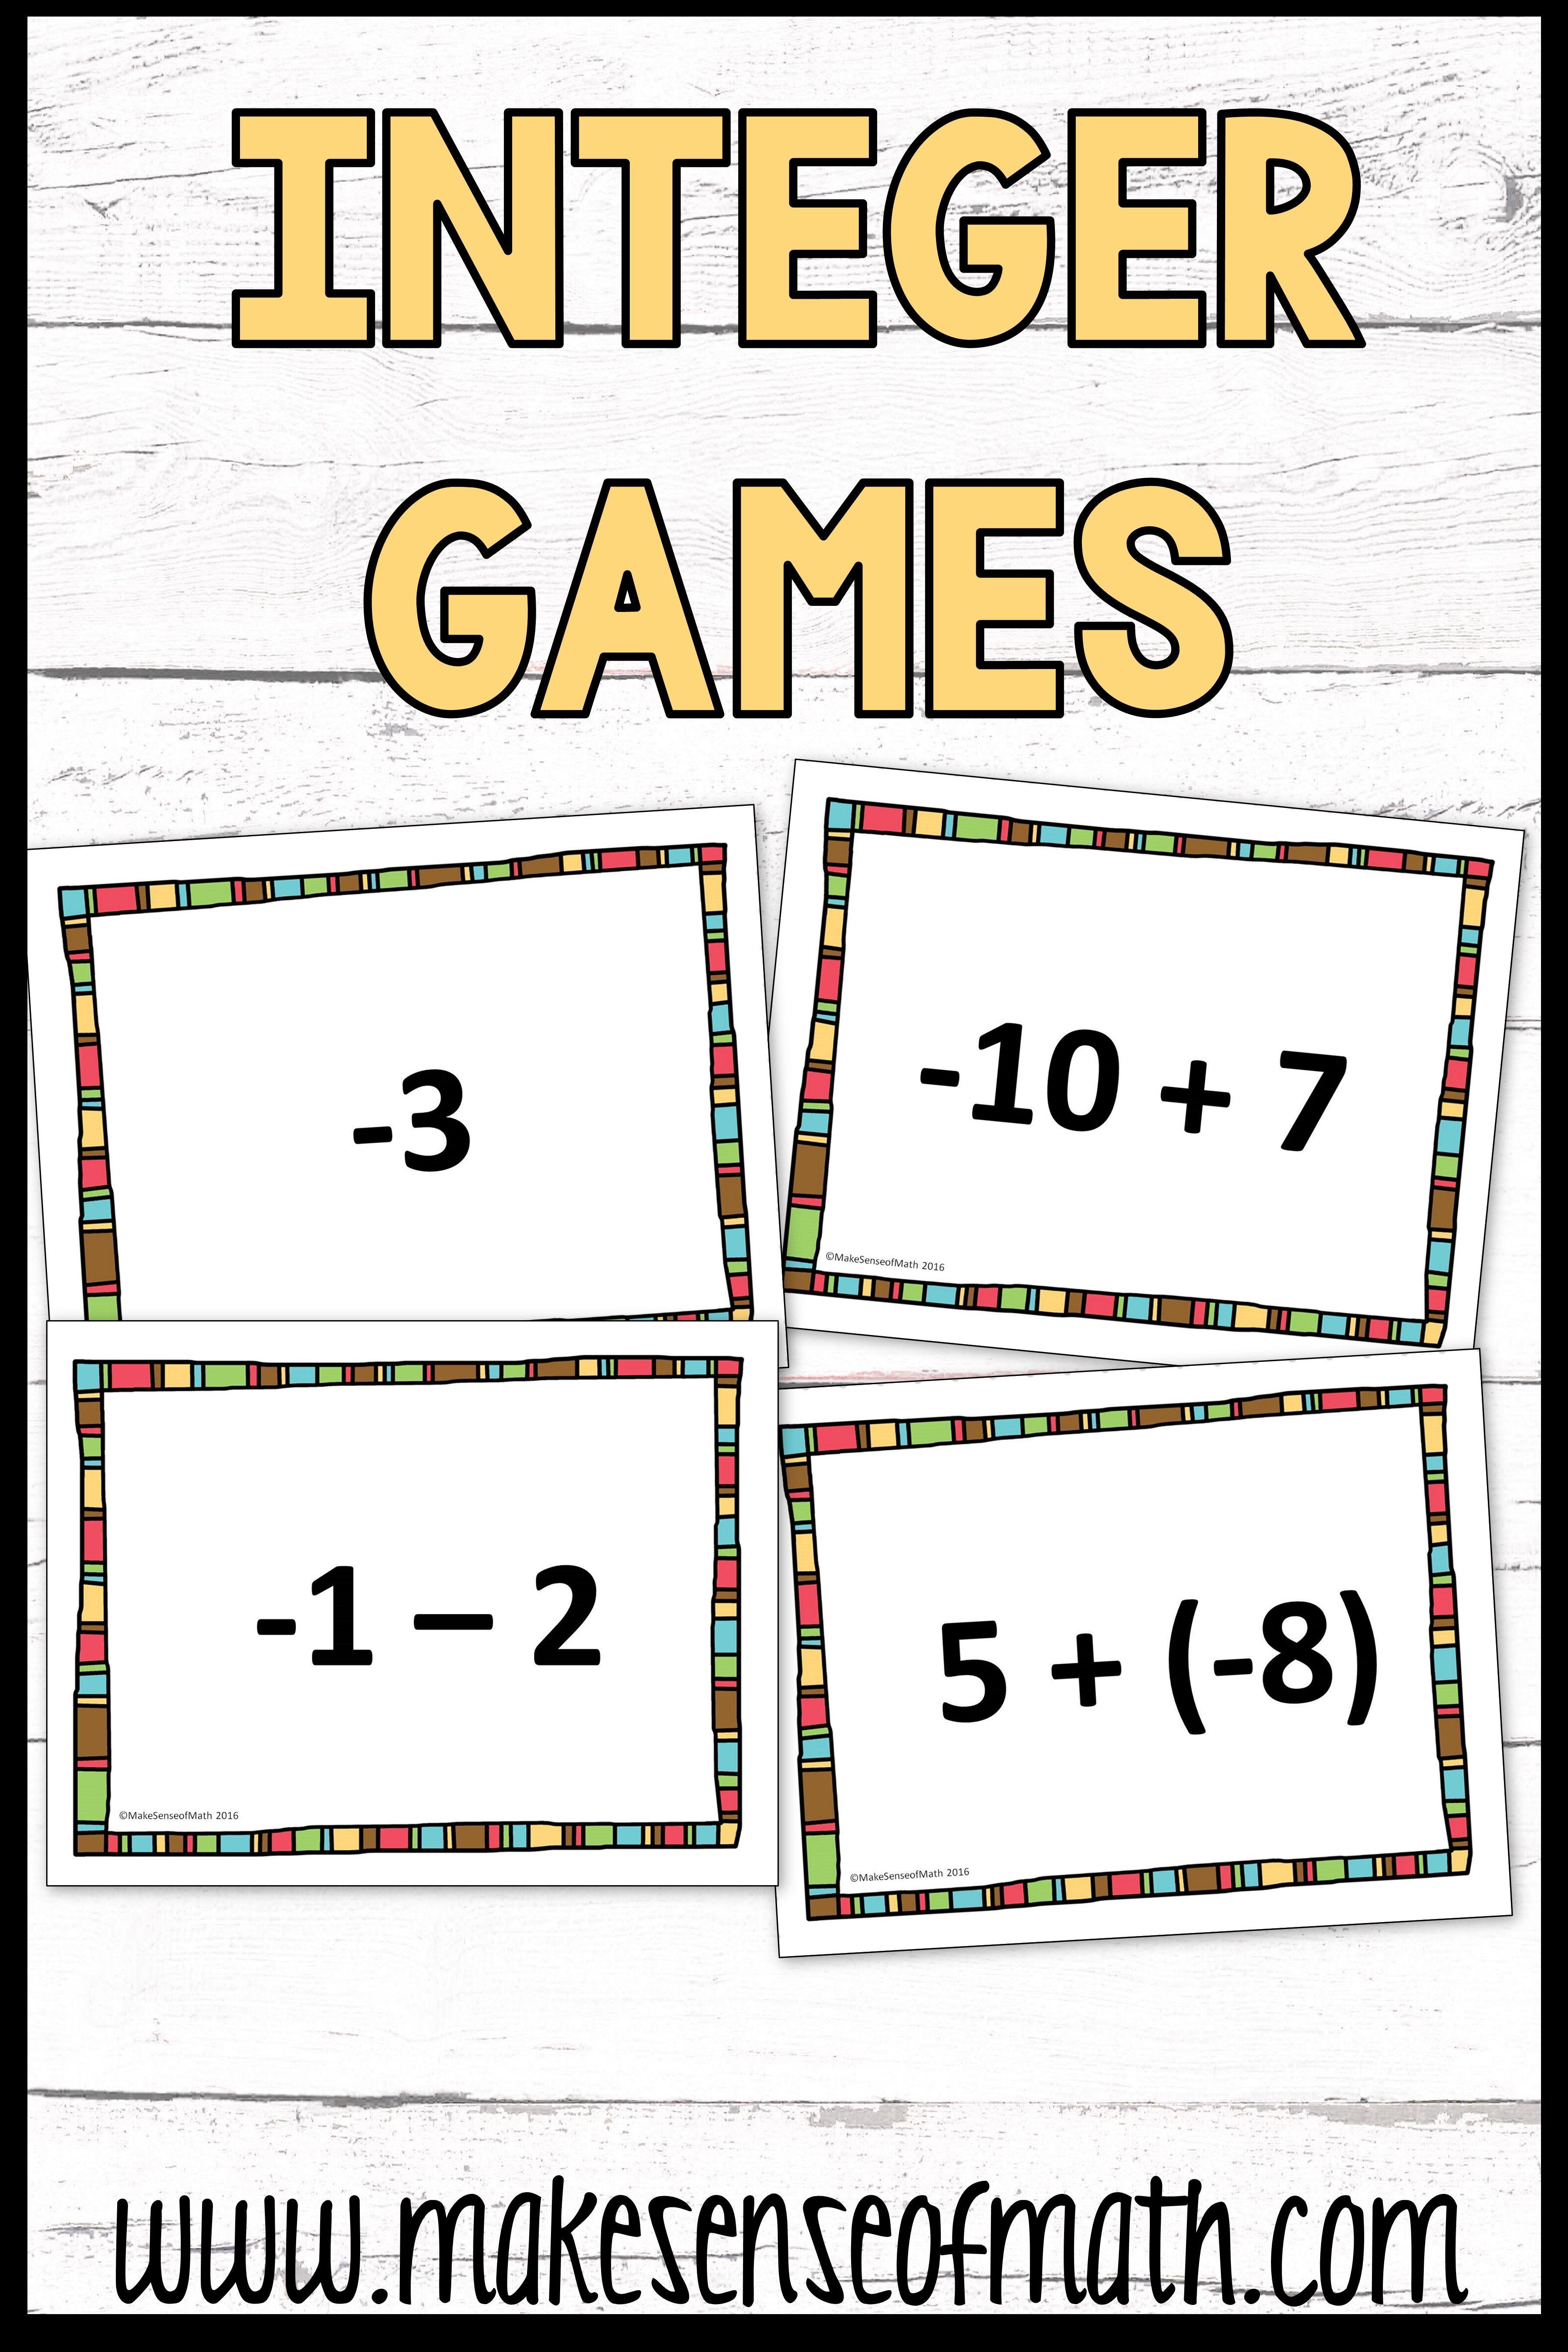 Adding And Subtracting Integers Activities Maths Activities Middle School Middle School Math Adding And Subtracting Integers Adding and subtracting integers fun